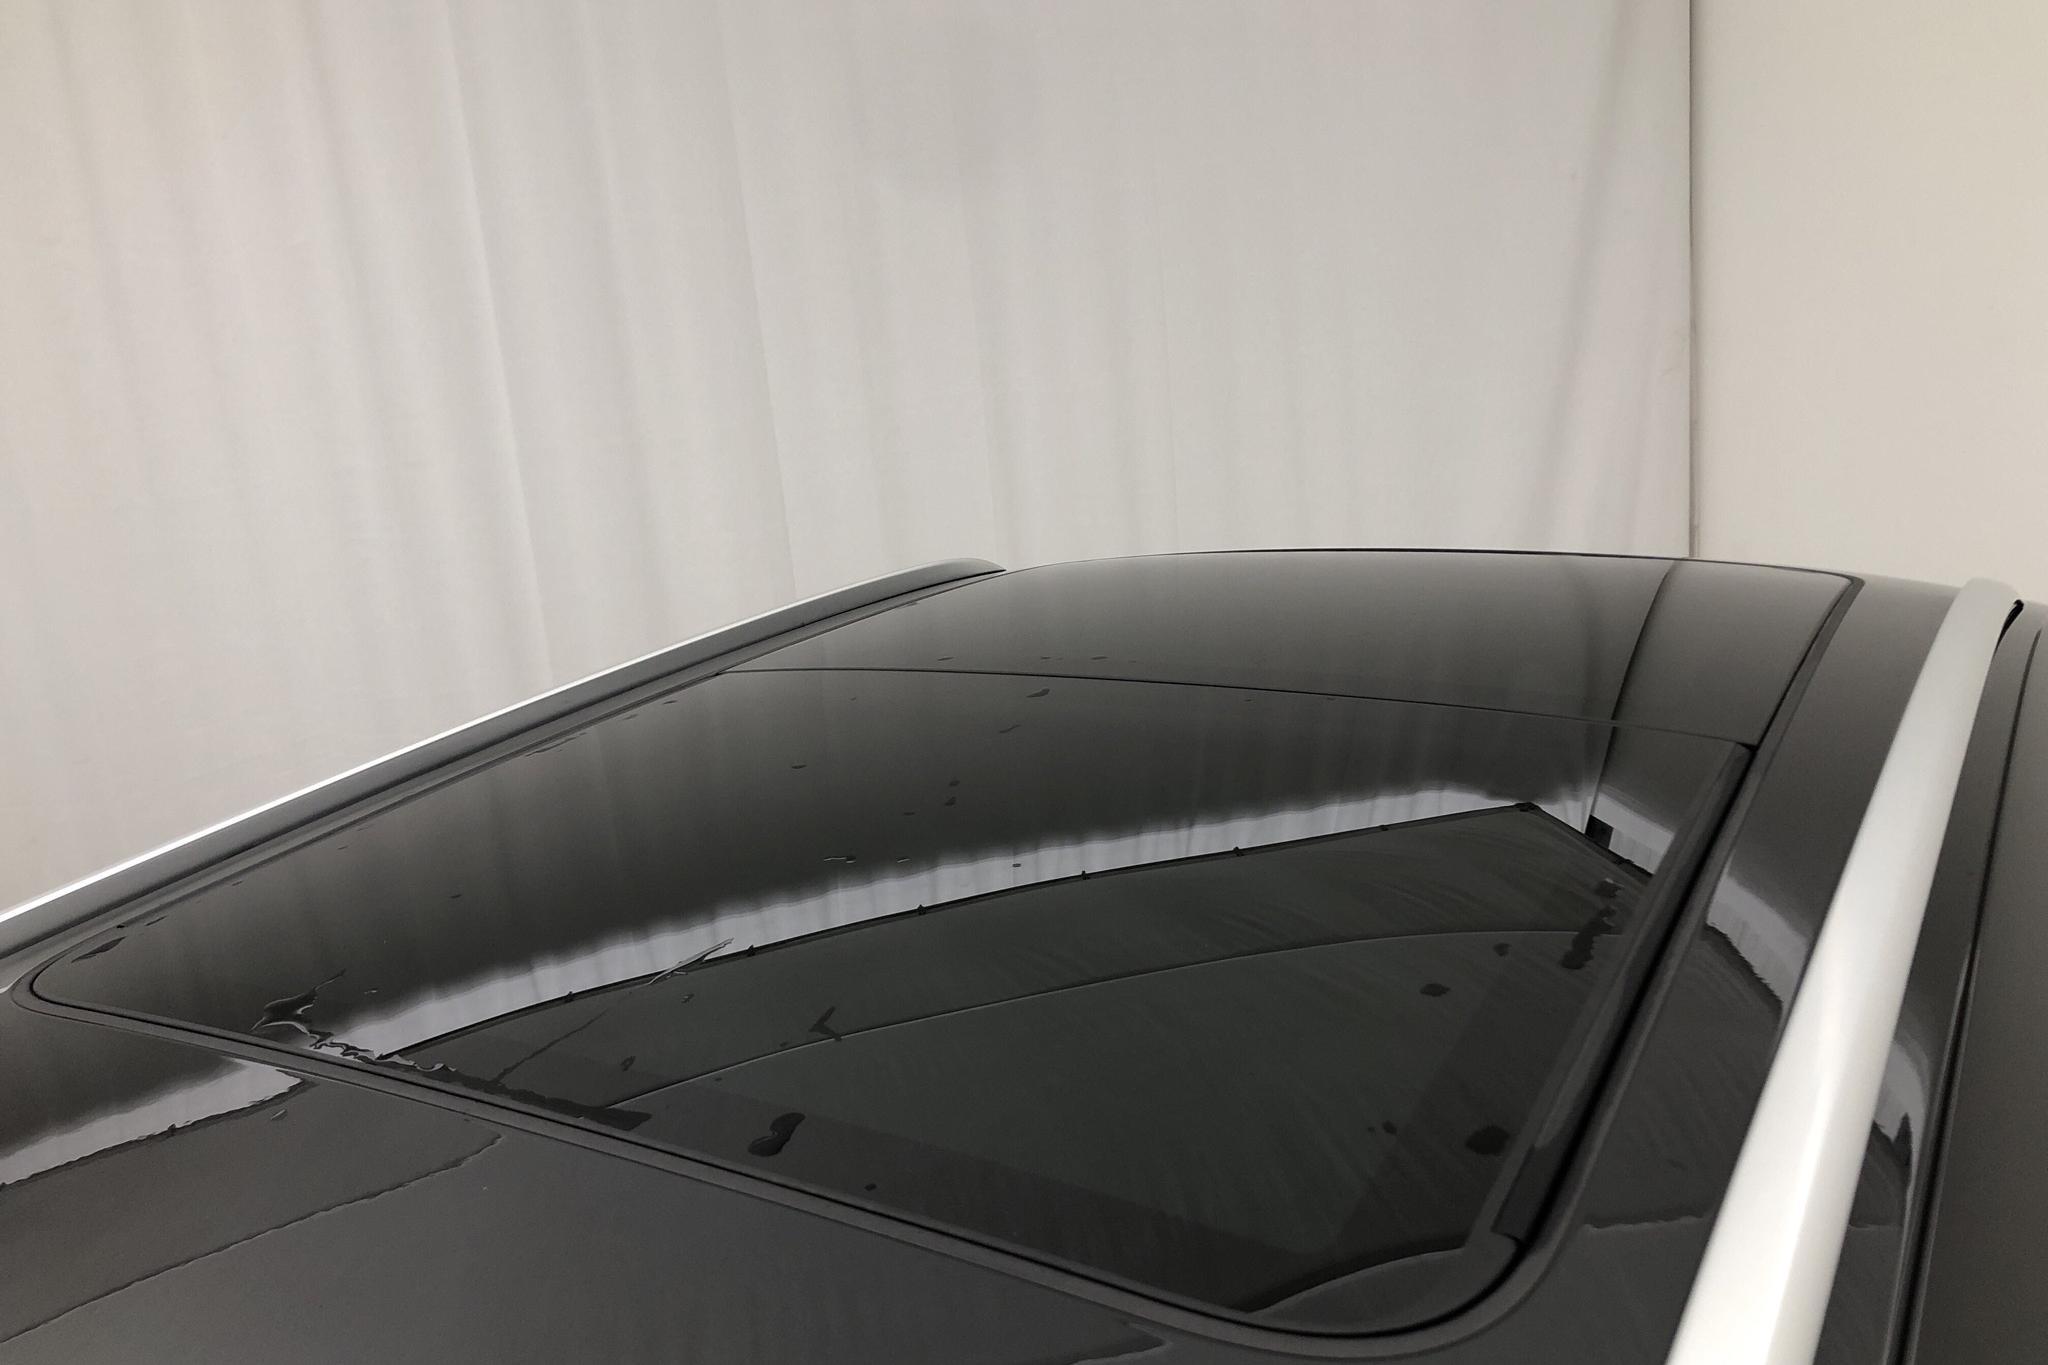 VW Passat 1.4 Plug-in-Hybrid Sportscombi (218hk) - 4 433 mil - Automat - Dark Grey - 2018